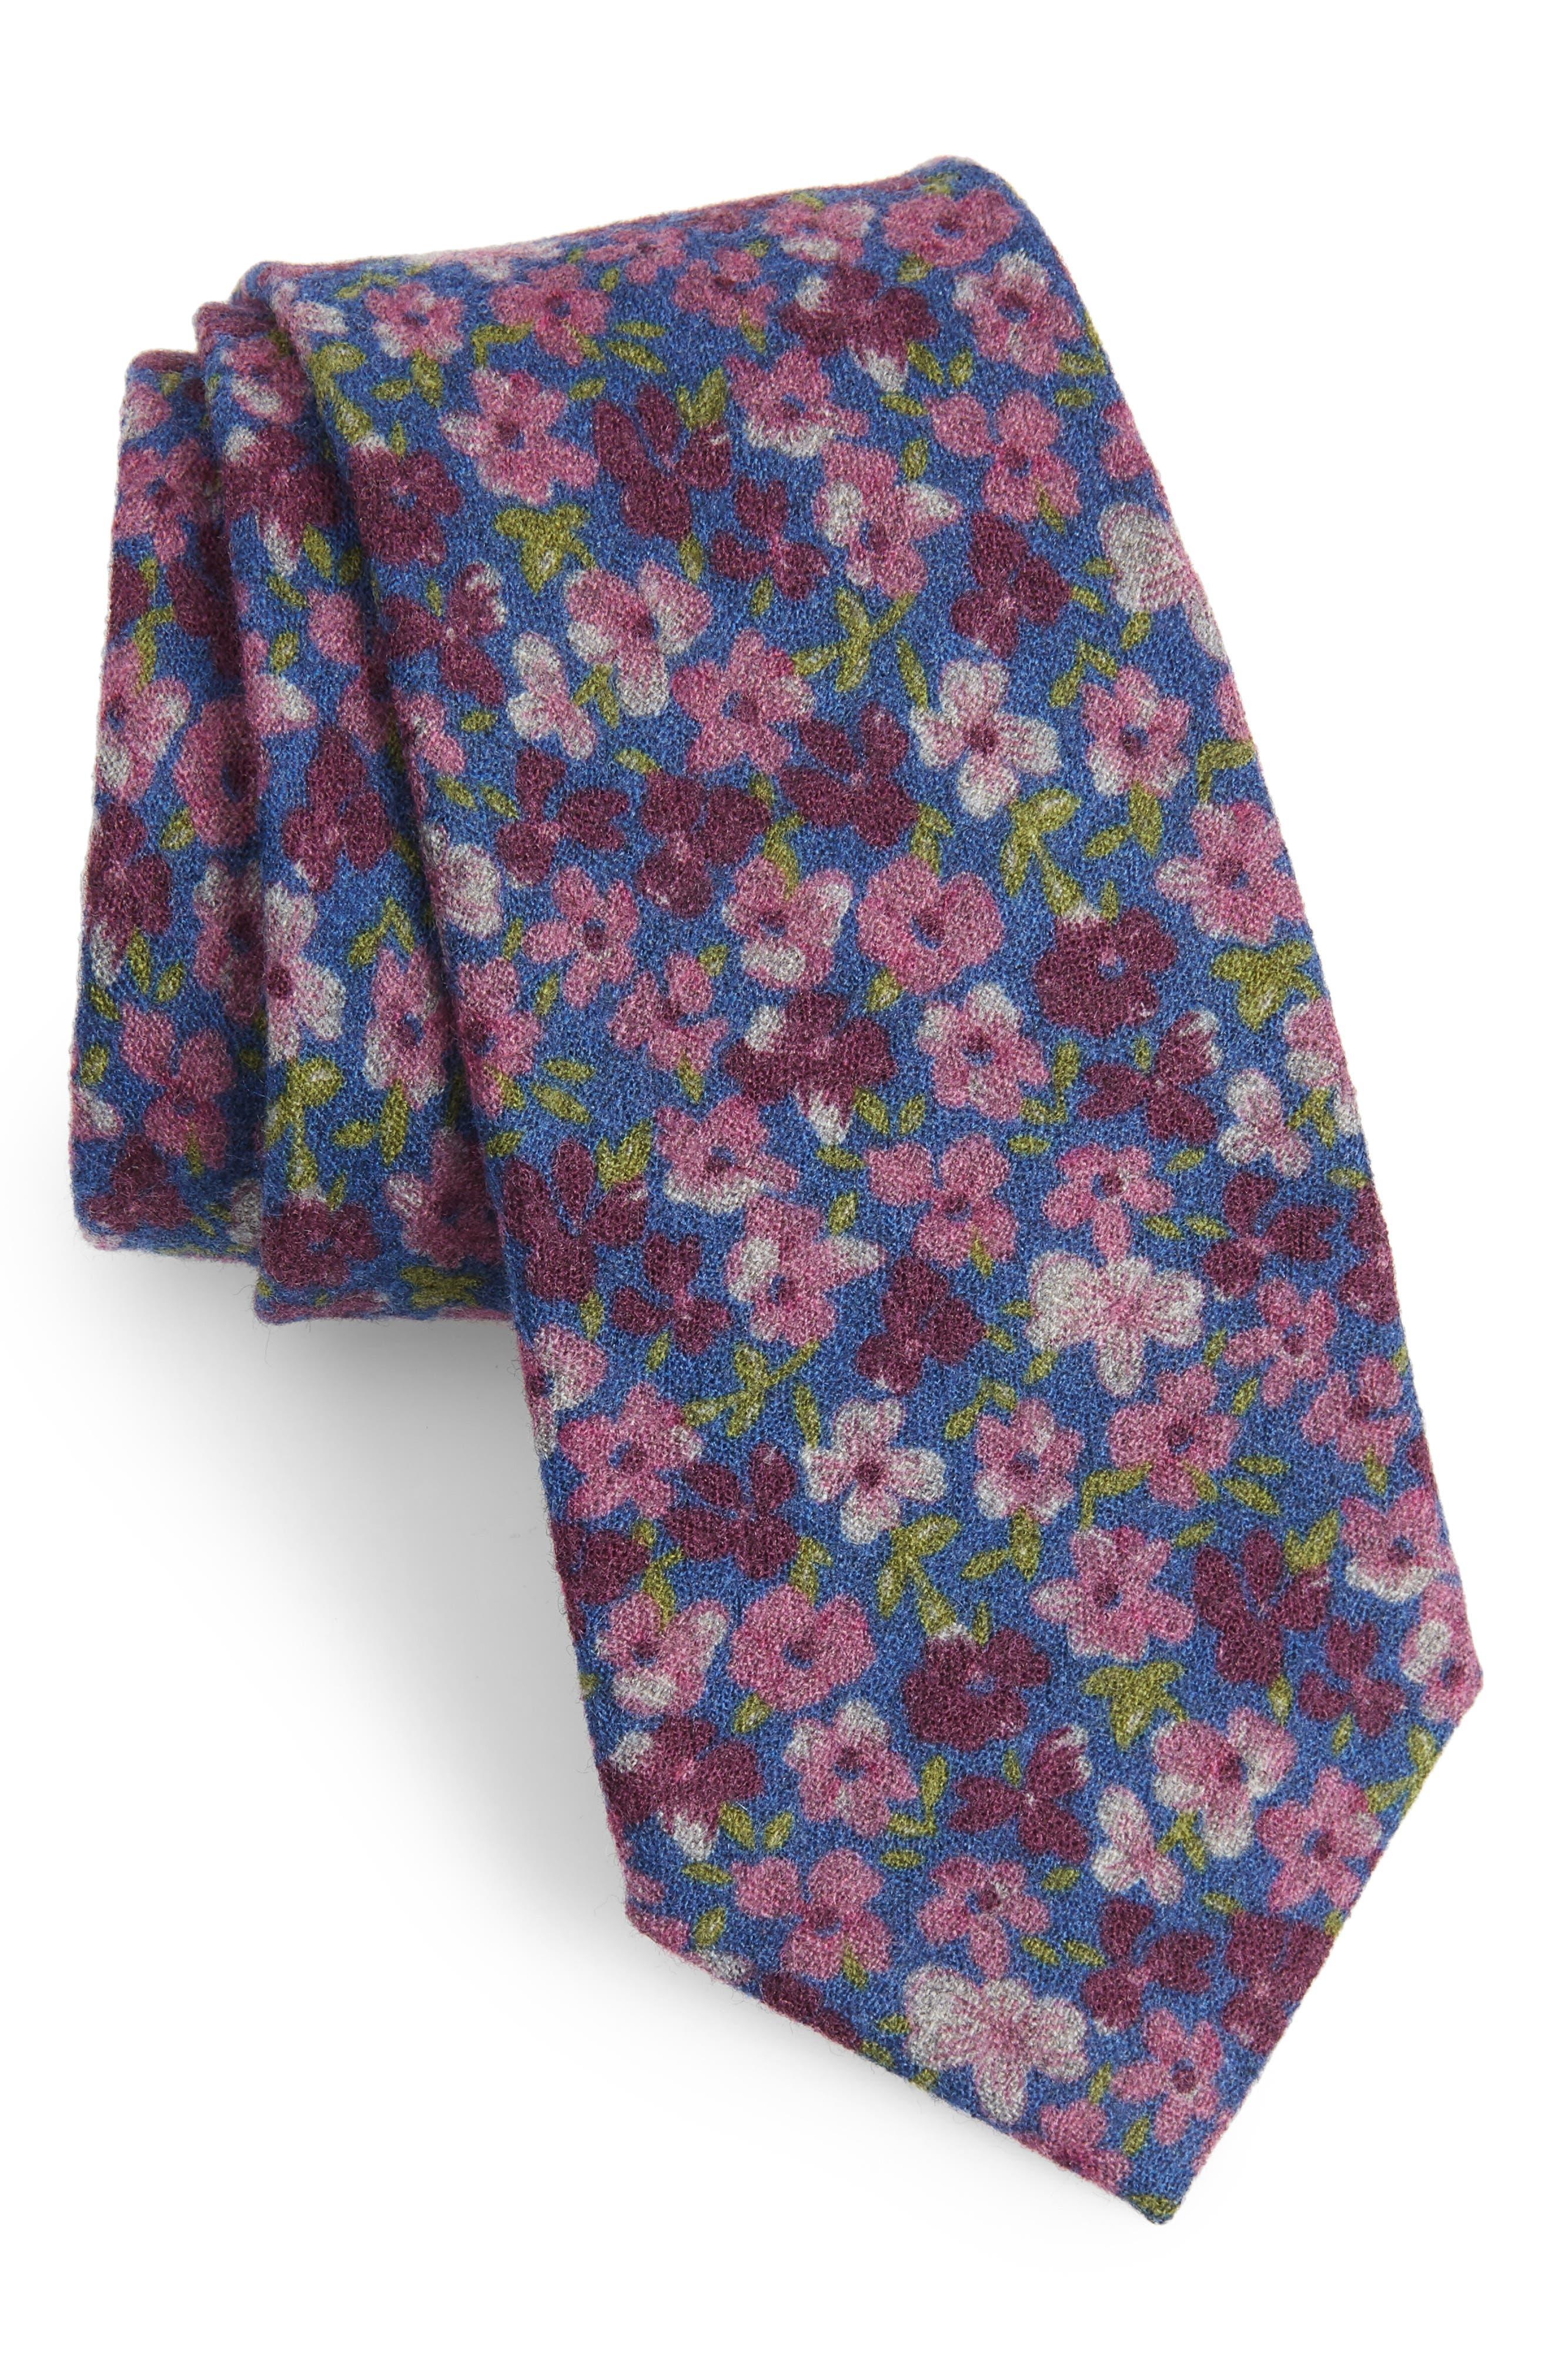 Garden Bloom Floral Wool Tie,                         Main,                         color, BLUE